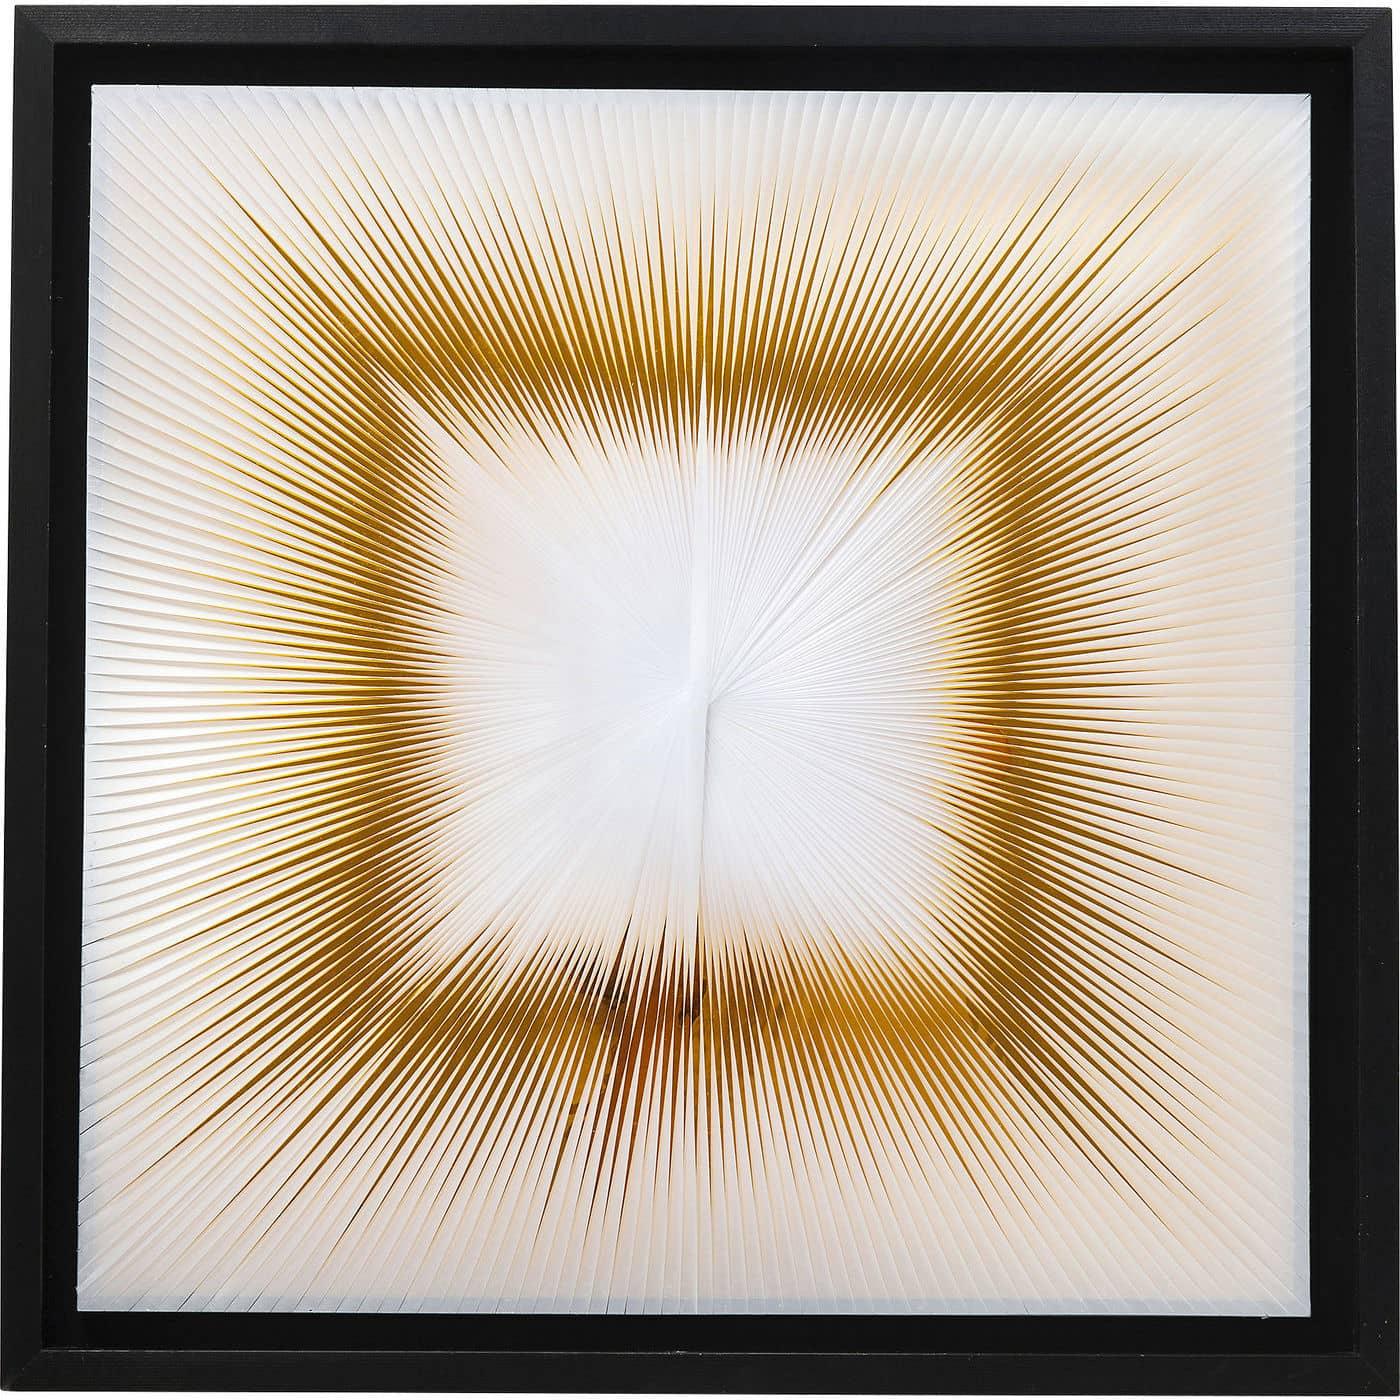 KARE DESIGN Wall Art Beam vgdekoration - gul/hvid/sort papir/hr/akryl/tr (90x90)